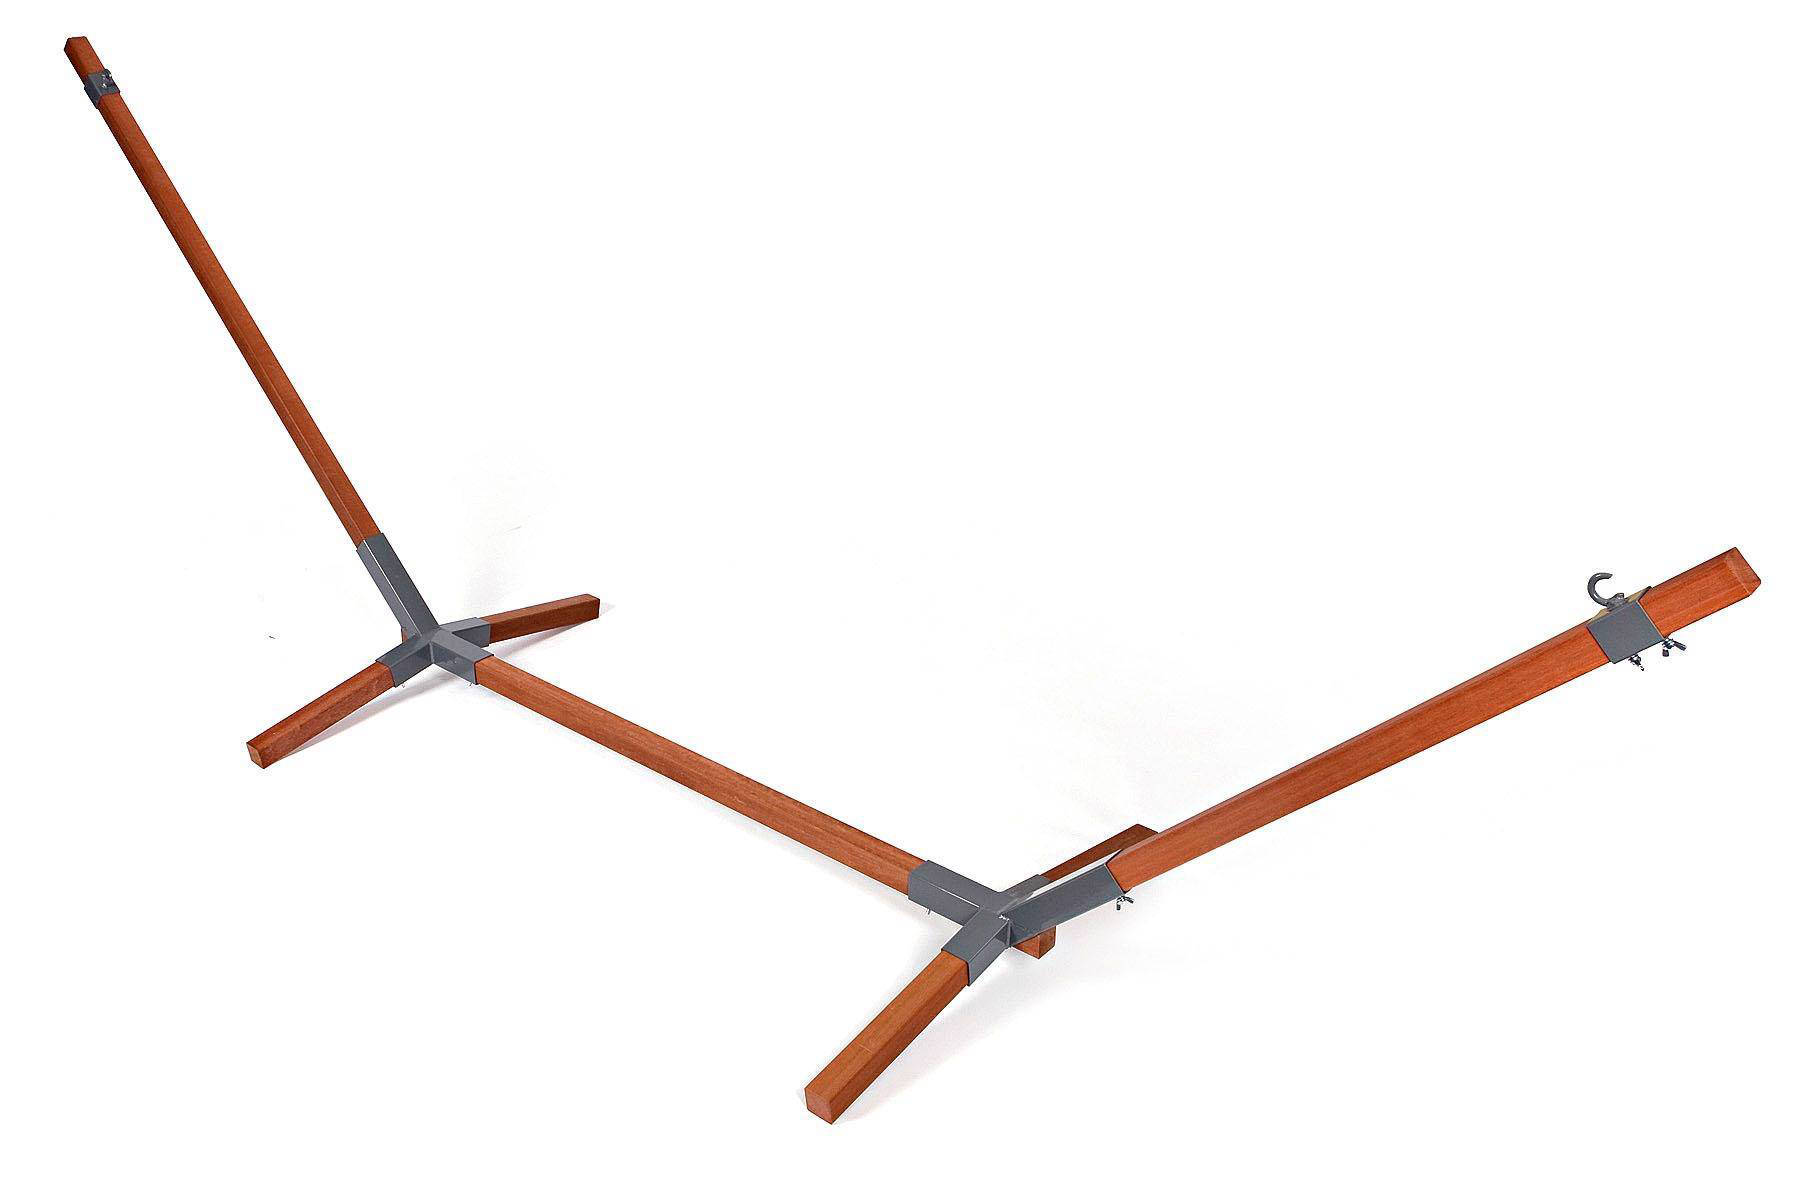 bo garden hangmat standaard (250 325 cm) wehkampbo garden hangmat standaard (250 325 cm), hout